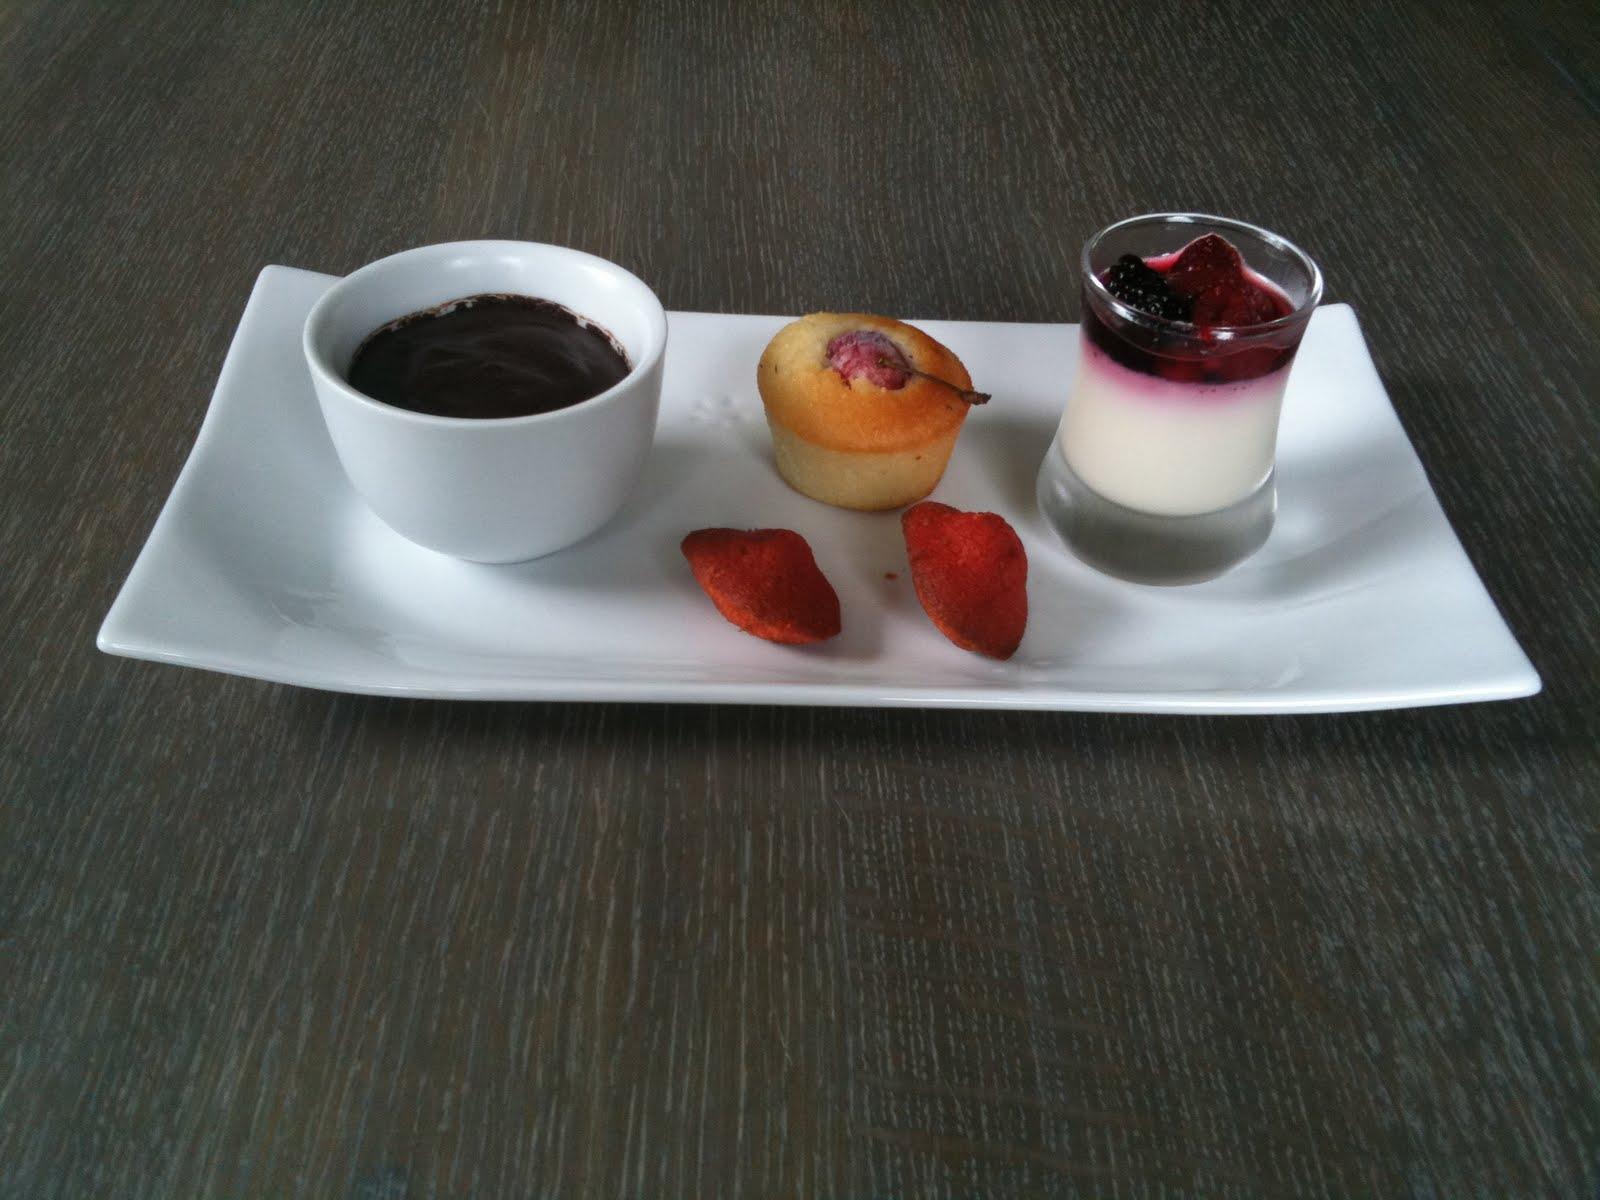 Dom cuisine panna cotta et mousse chocolat mignardises - Panna cotta herve cuisine ...